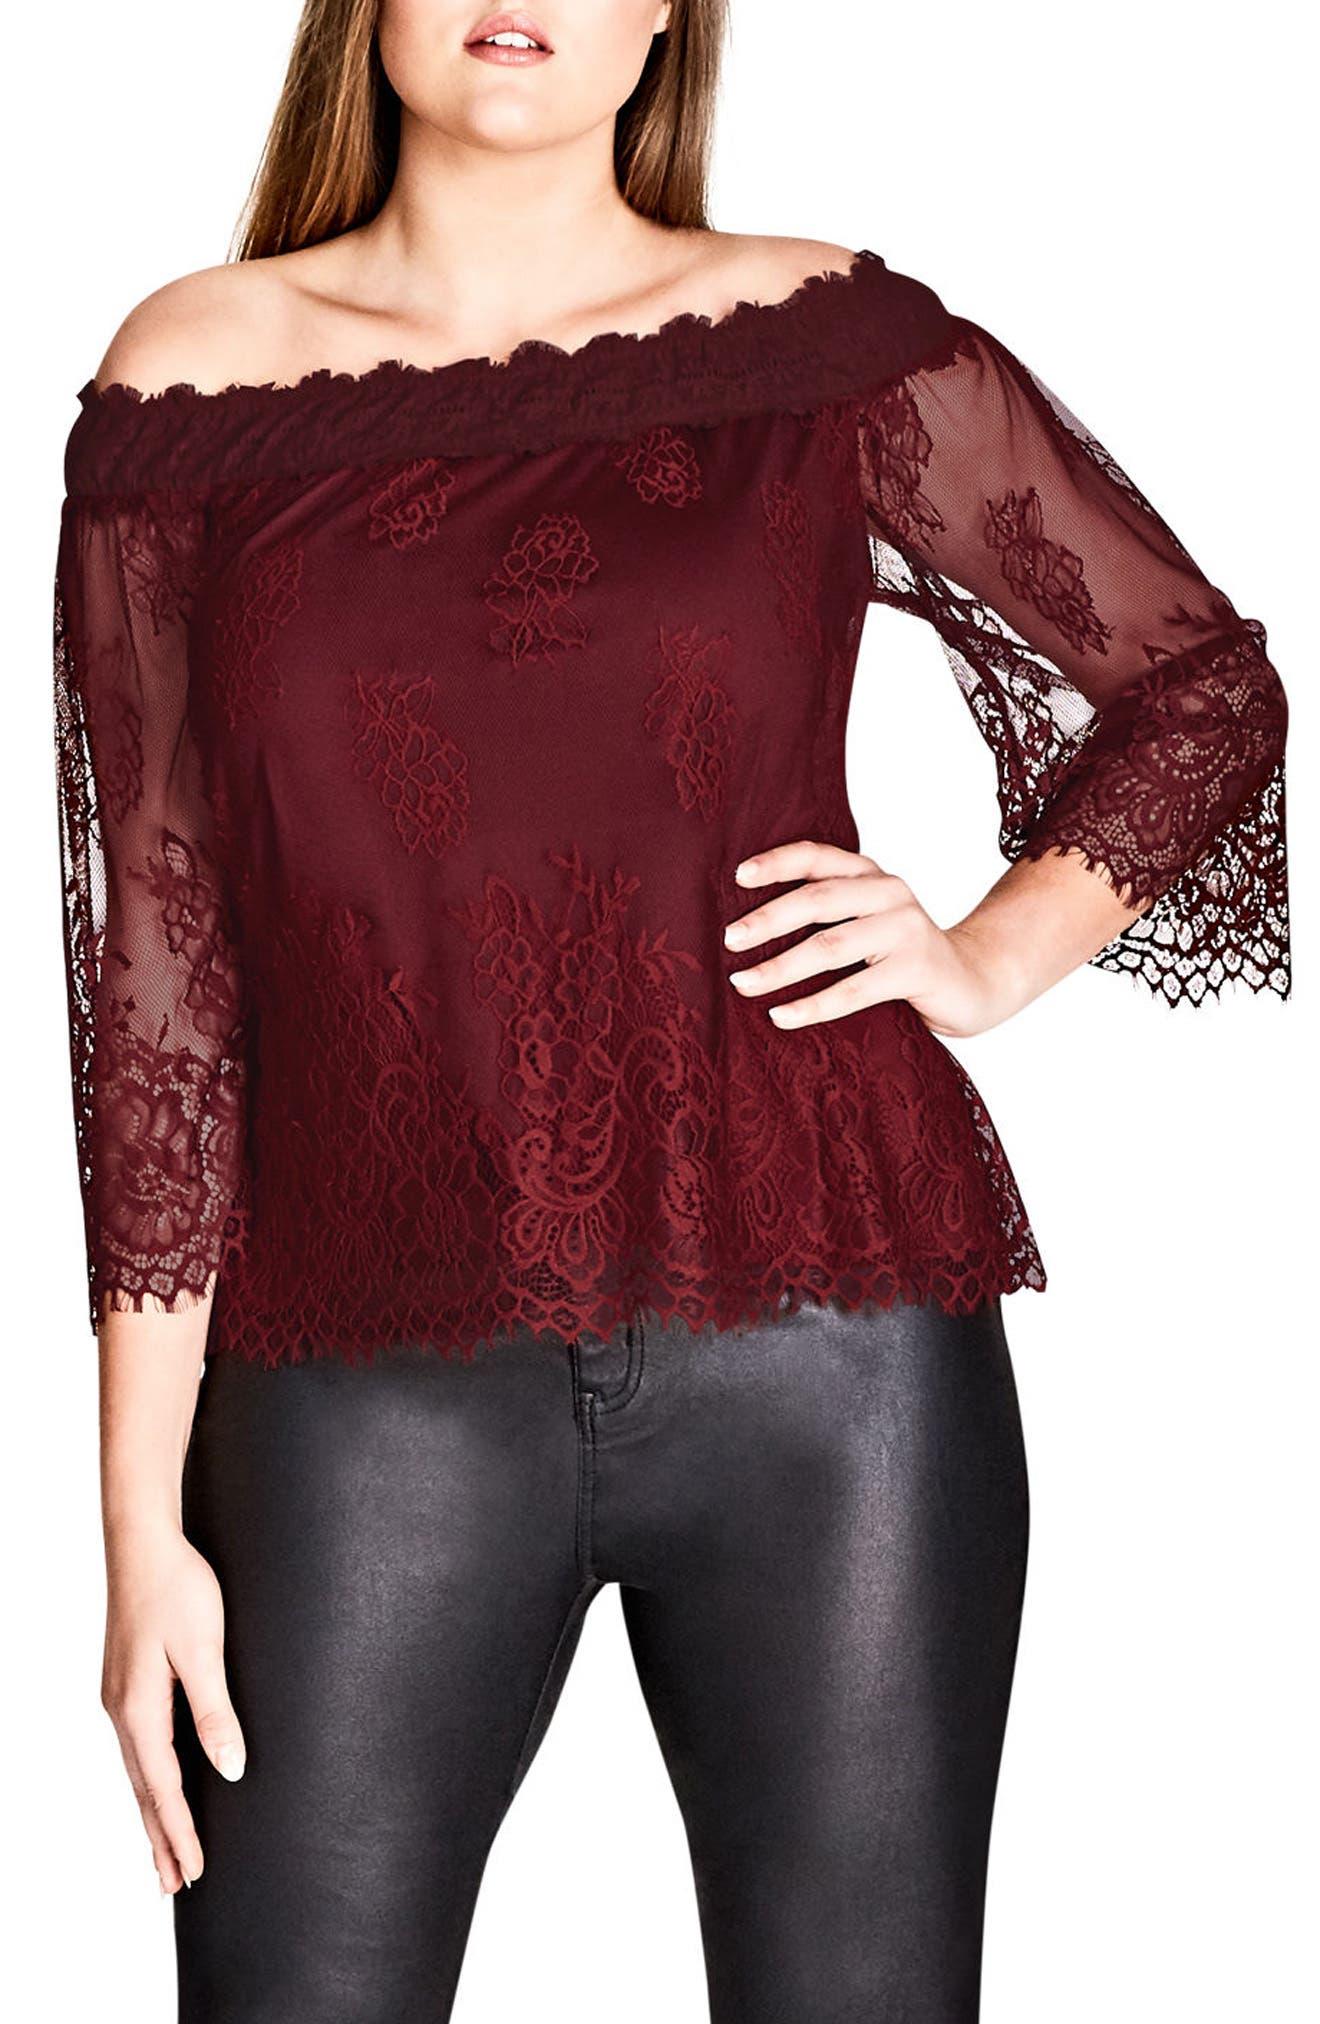 Main Image - City Chic Soft Lace Off the Shoulder Top (Plus Size)